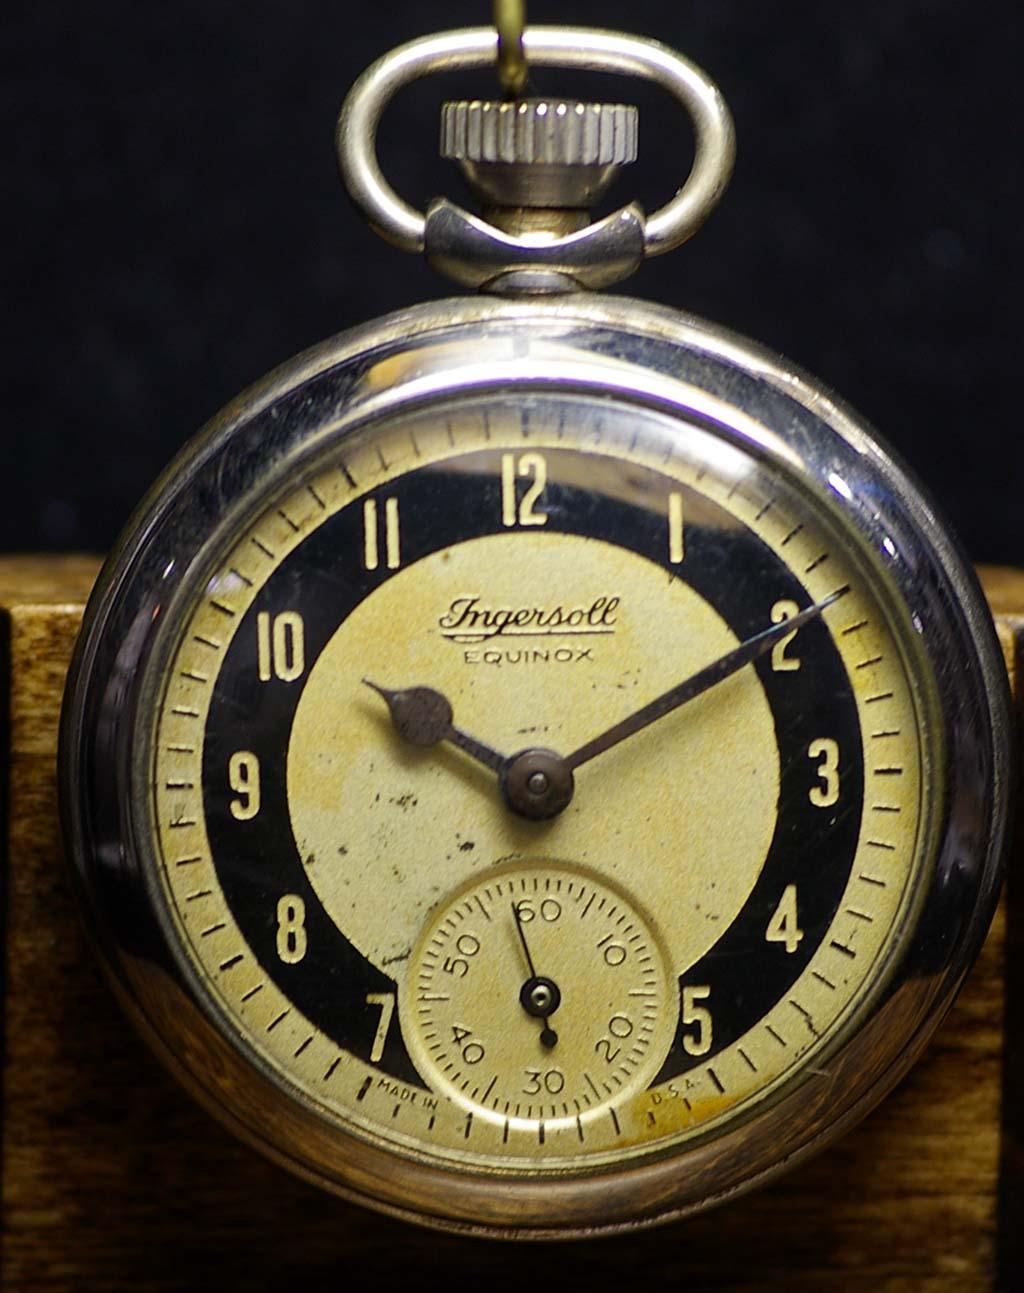 Ingersoll triumph pocket watch dating 9